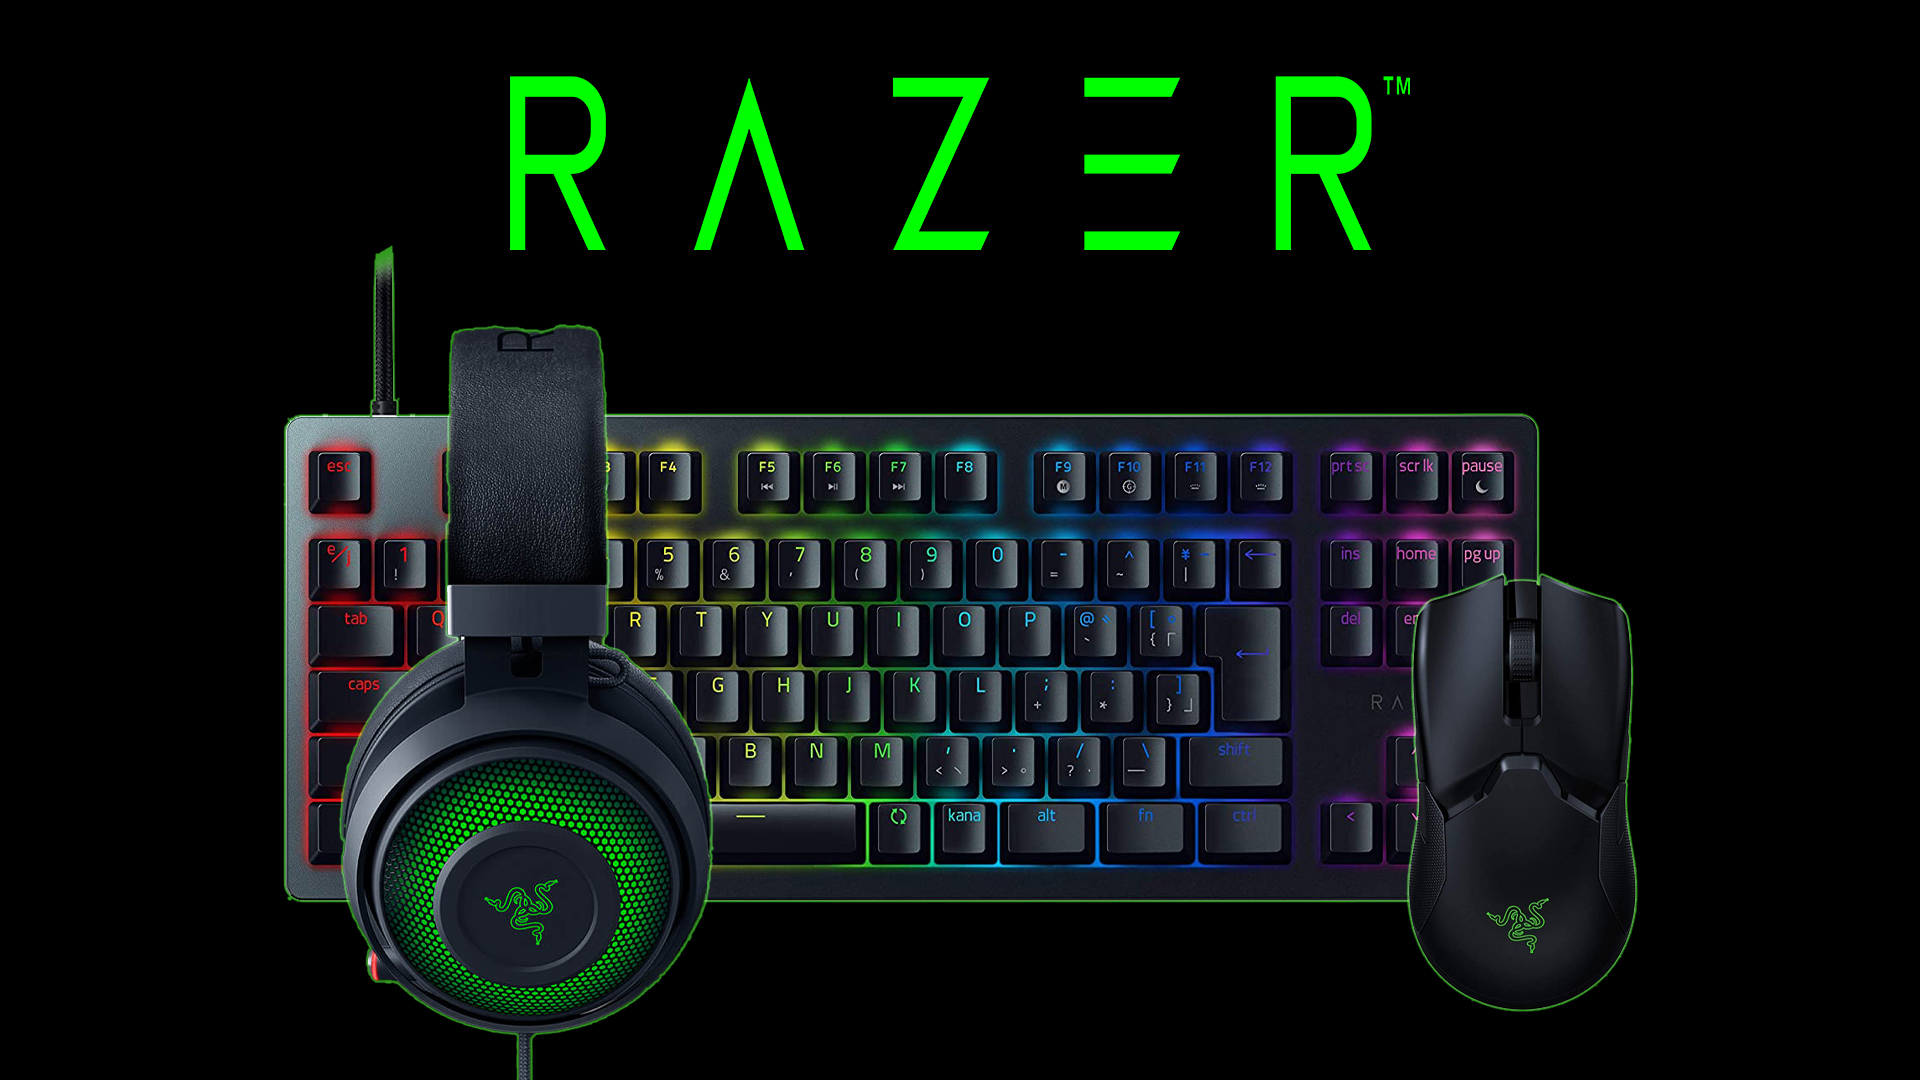 Amazonプライムデーで「Viper Ultimate」「Huntsman TE」「Kraken Ultimate」などRazerデバイスがセール価格で販売中!